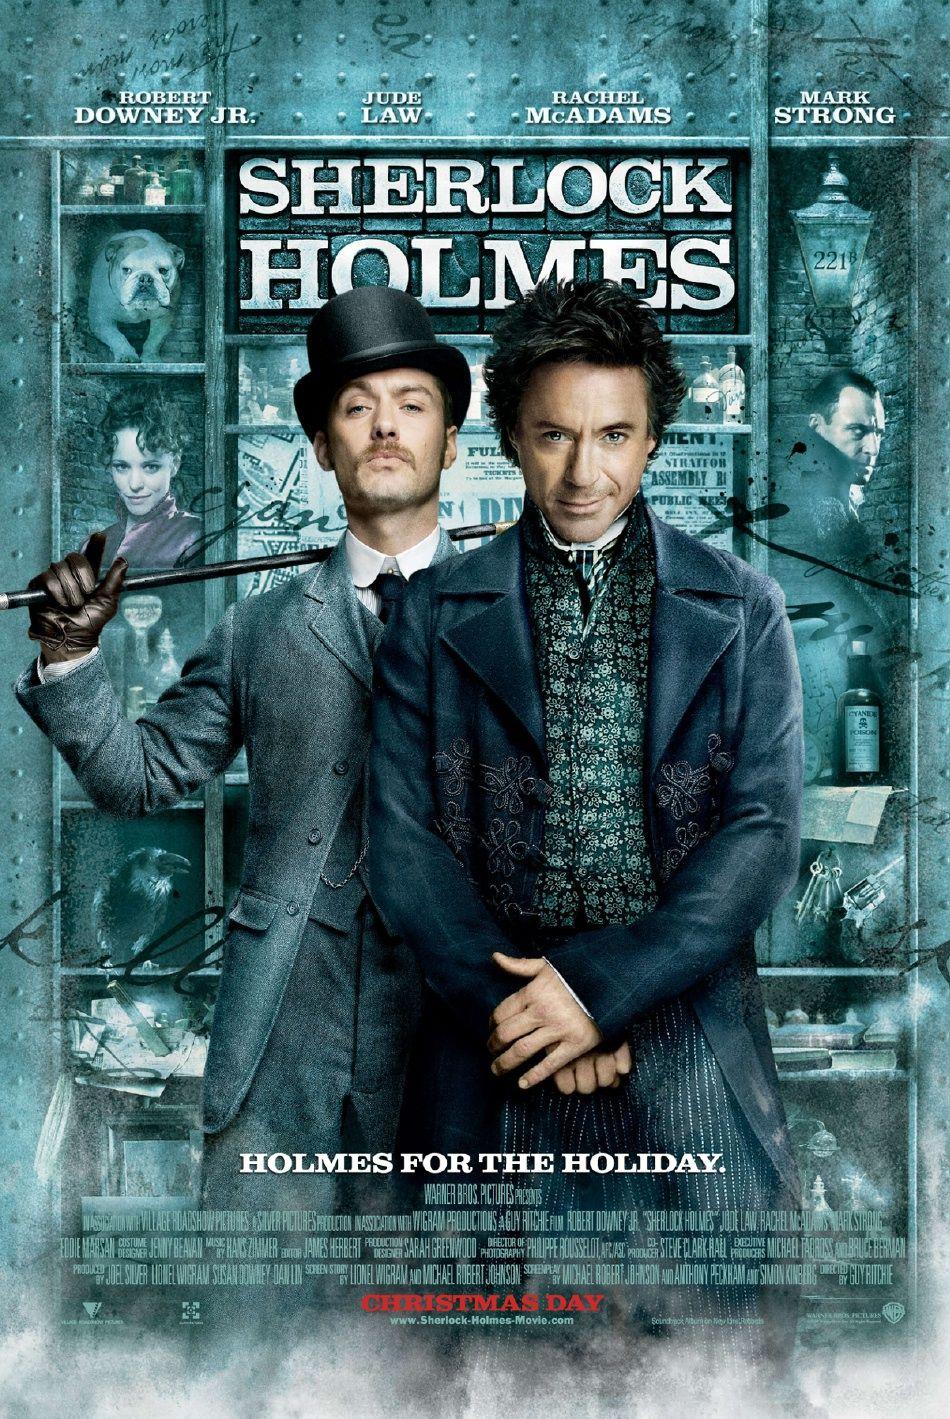 Póster de Sherlock Holmes (2009). Imagen: impawards.com